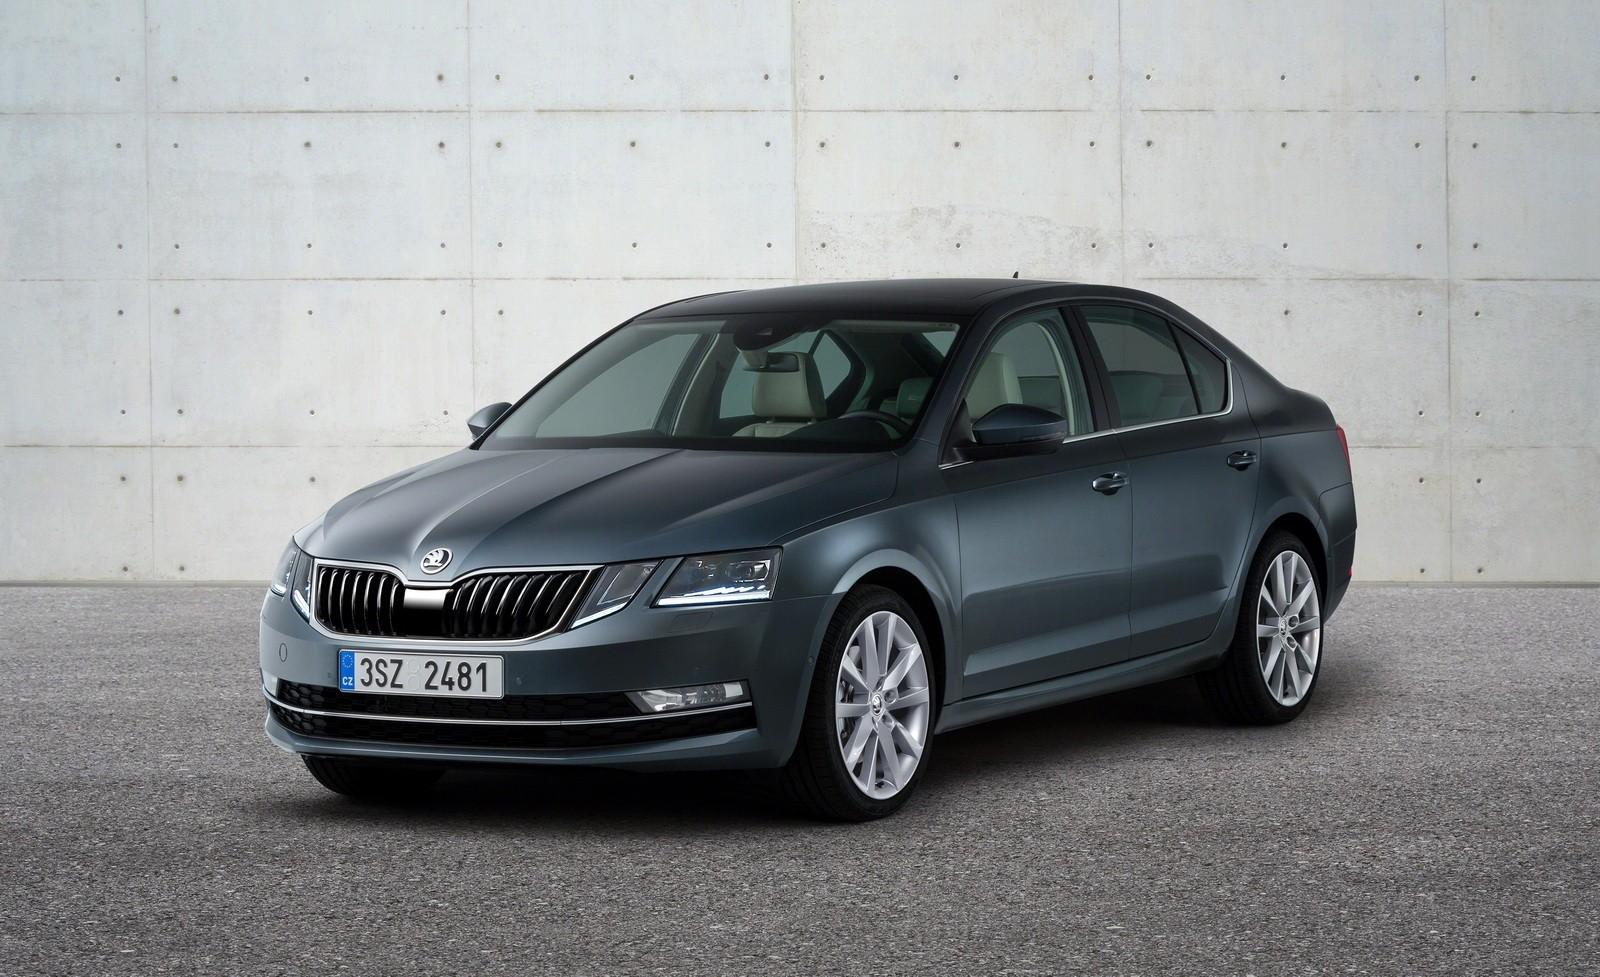 Шкода Octavia признан лучшим автомобилем года вГермании